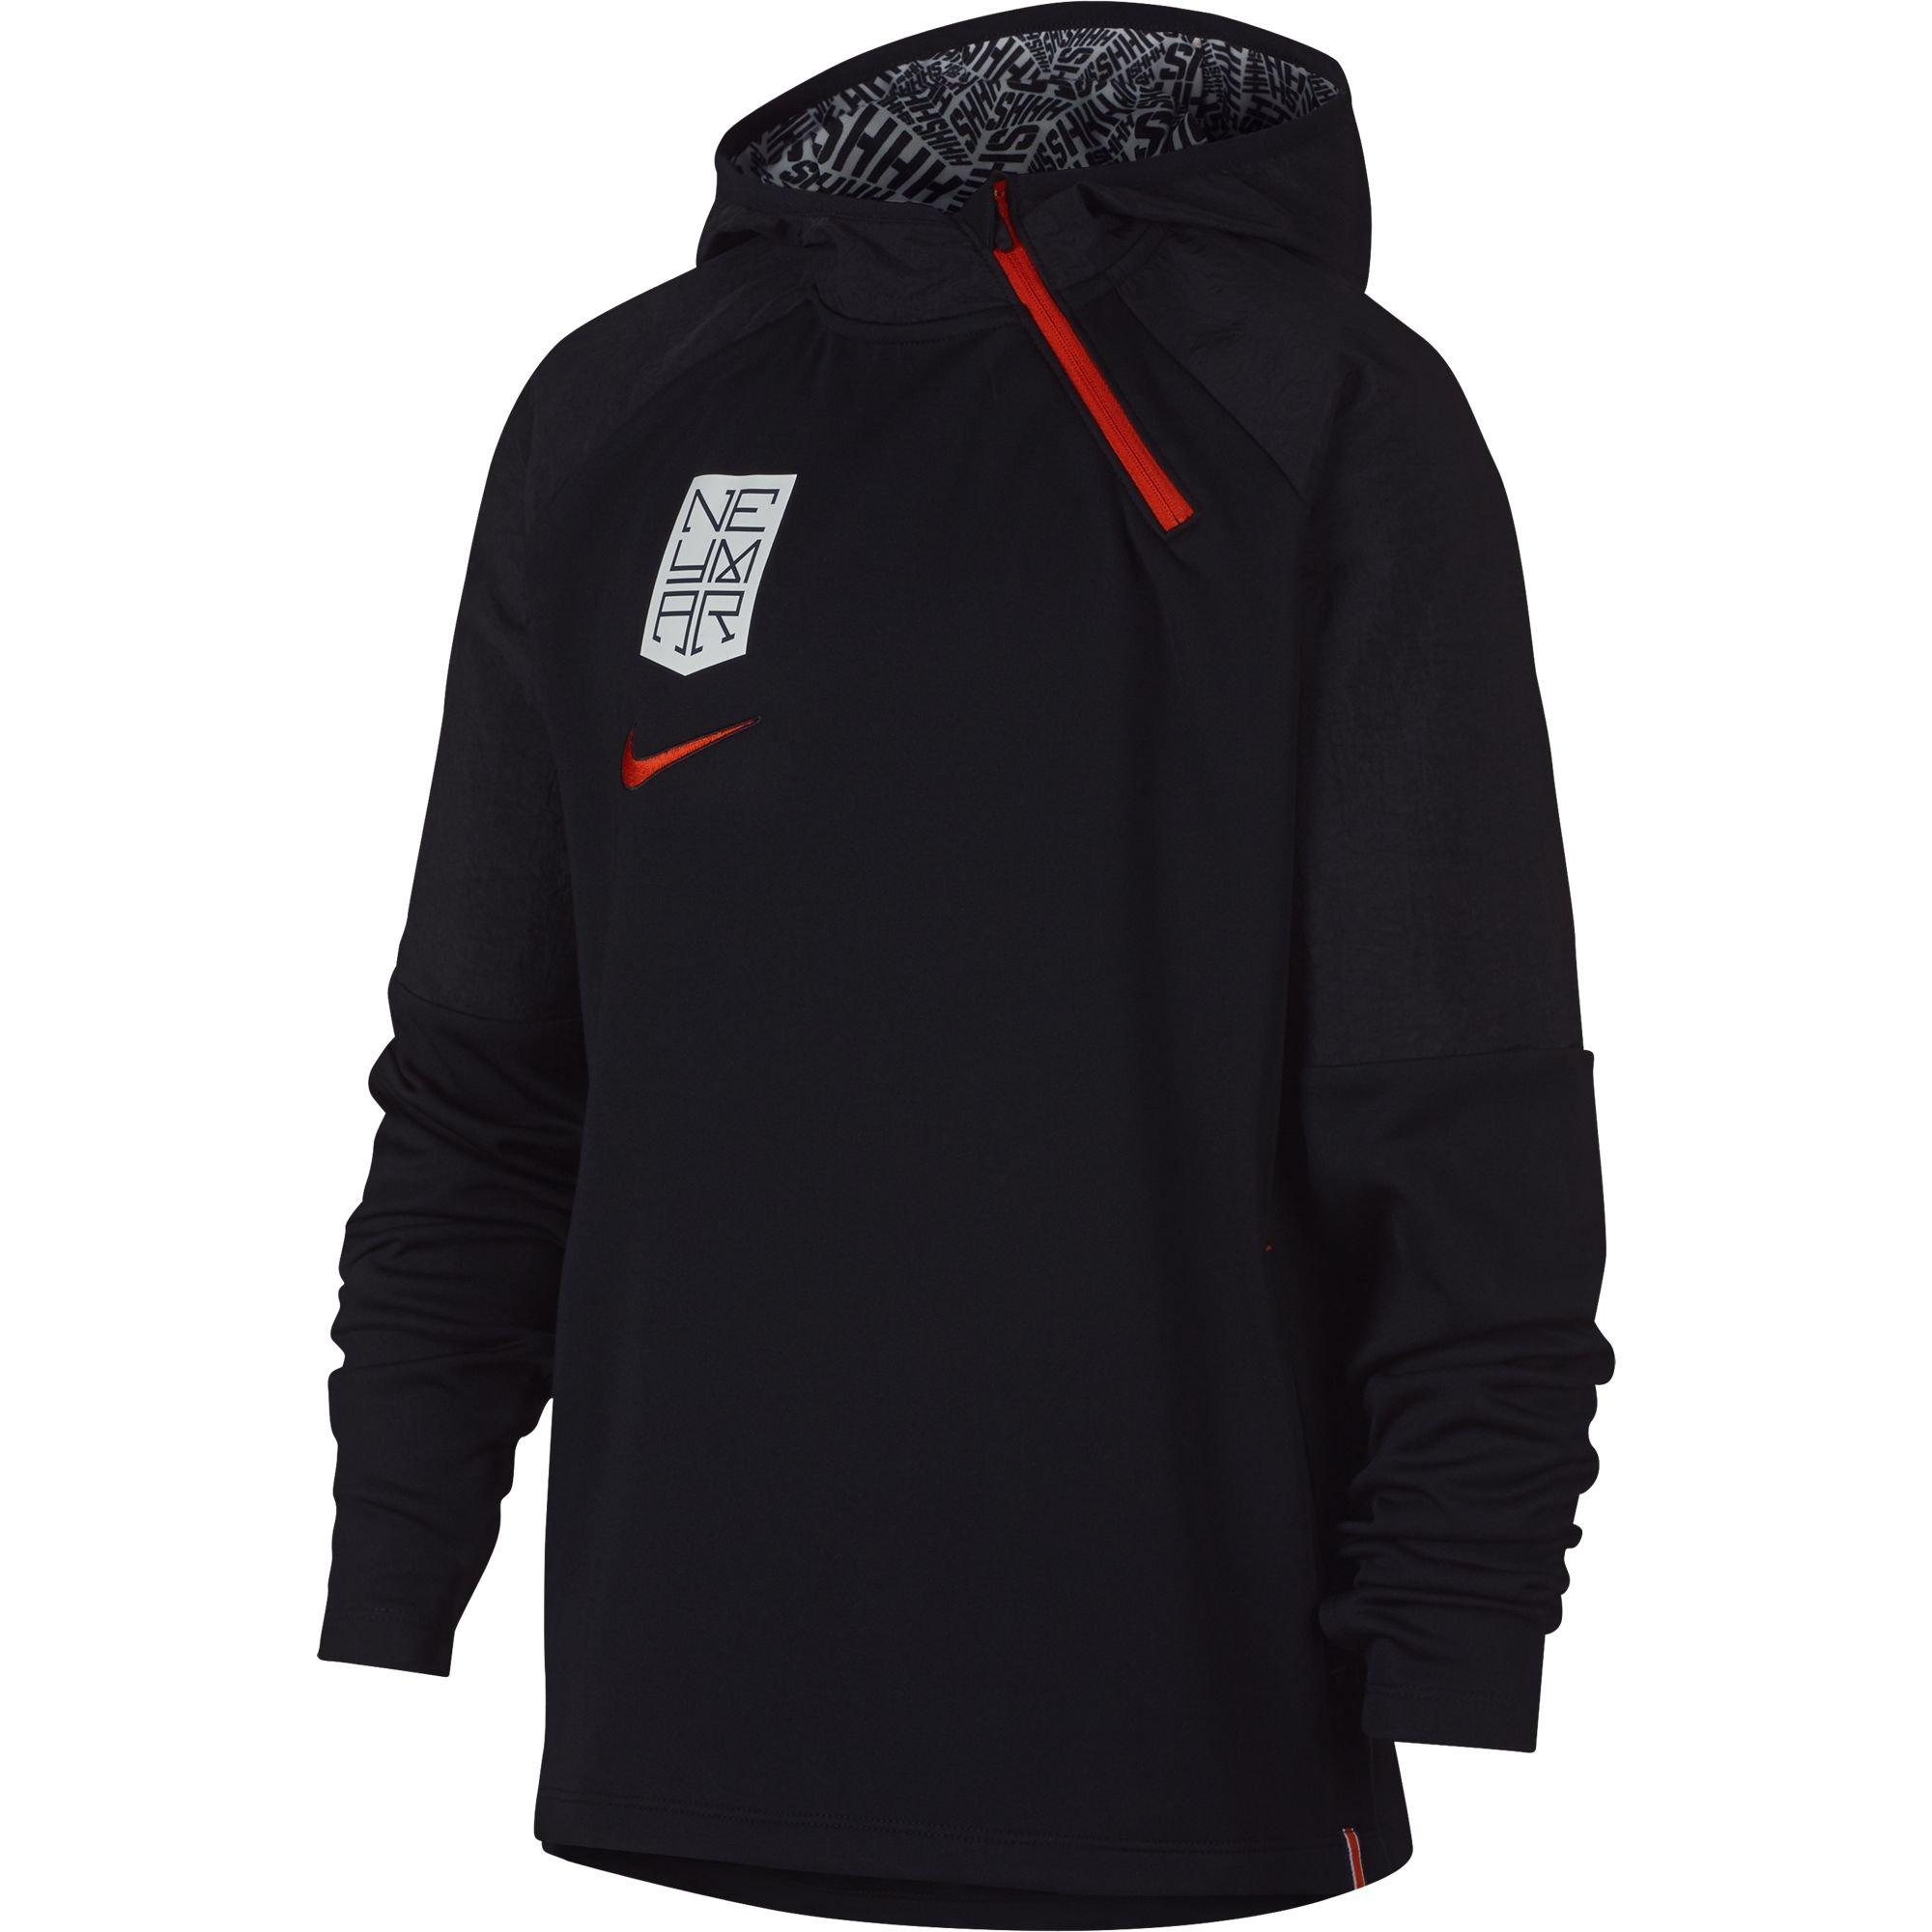 Sweatshirt Nike Squad Drill Top Junior 807245 687